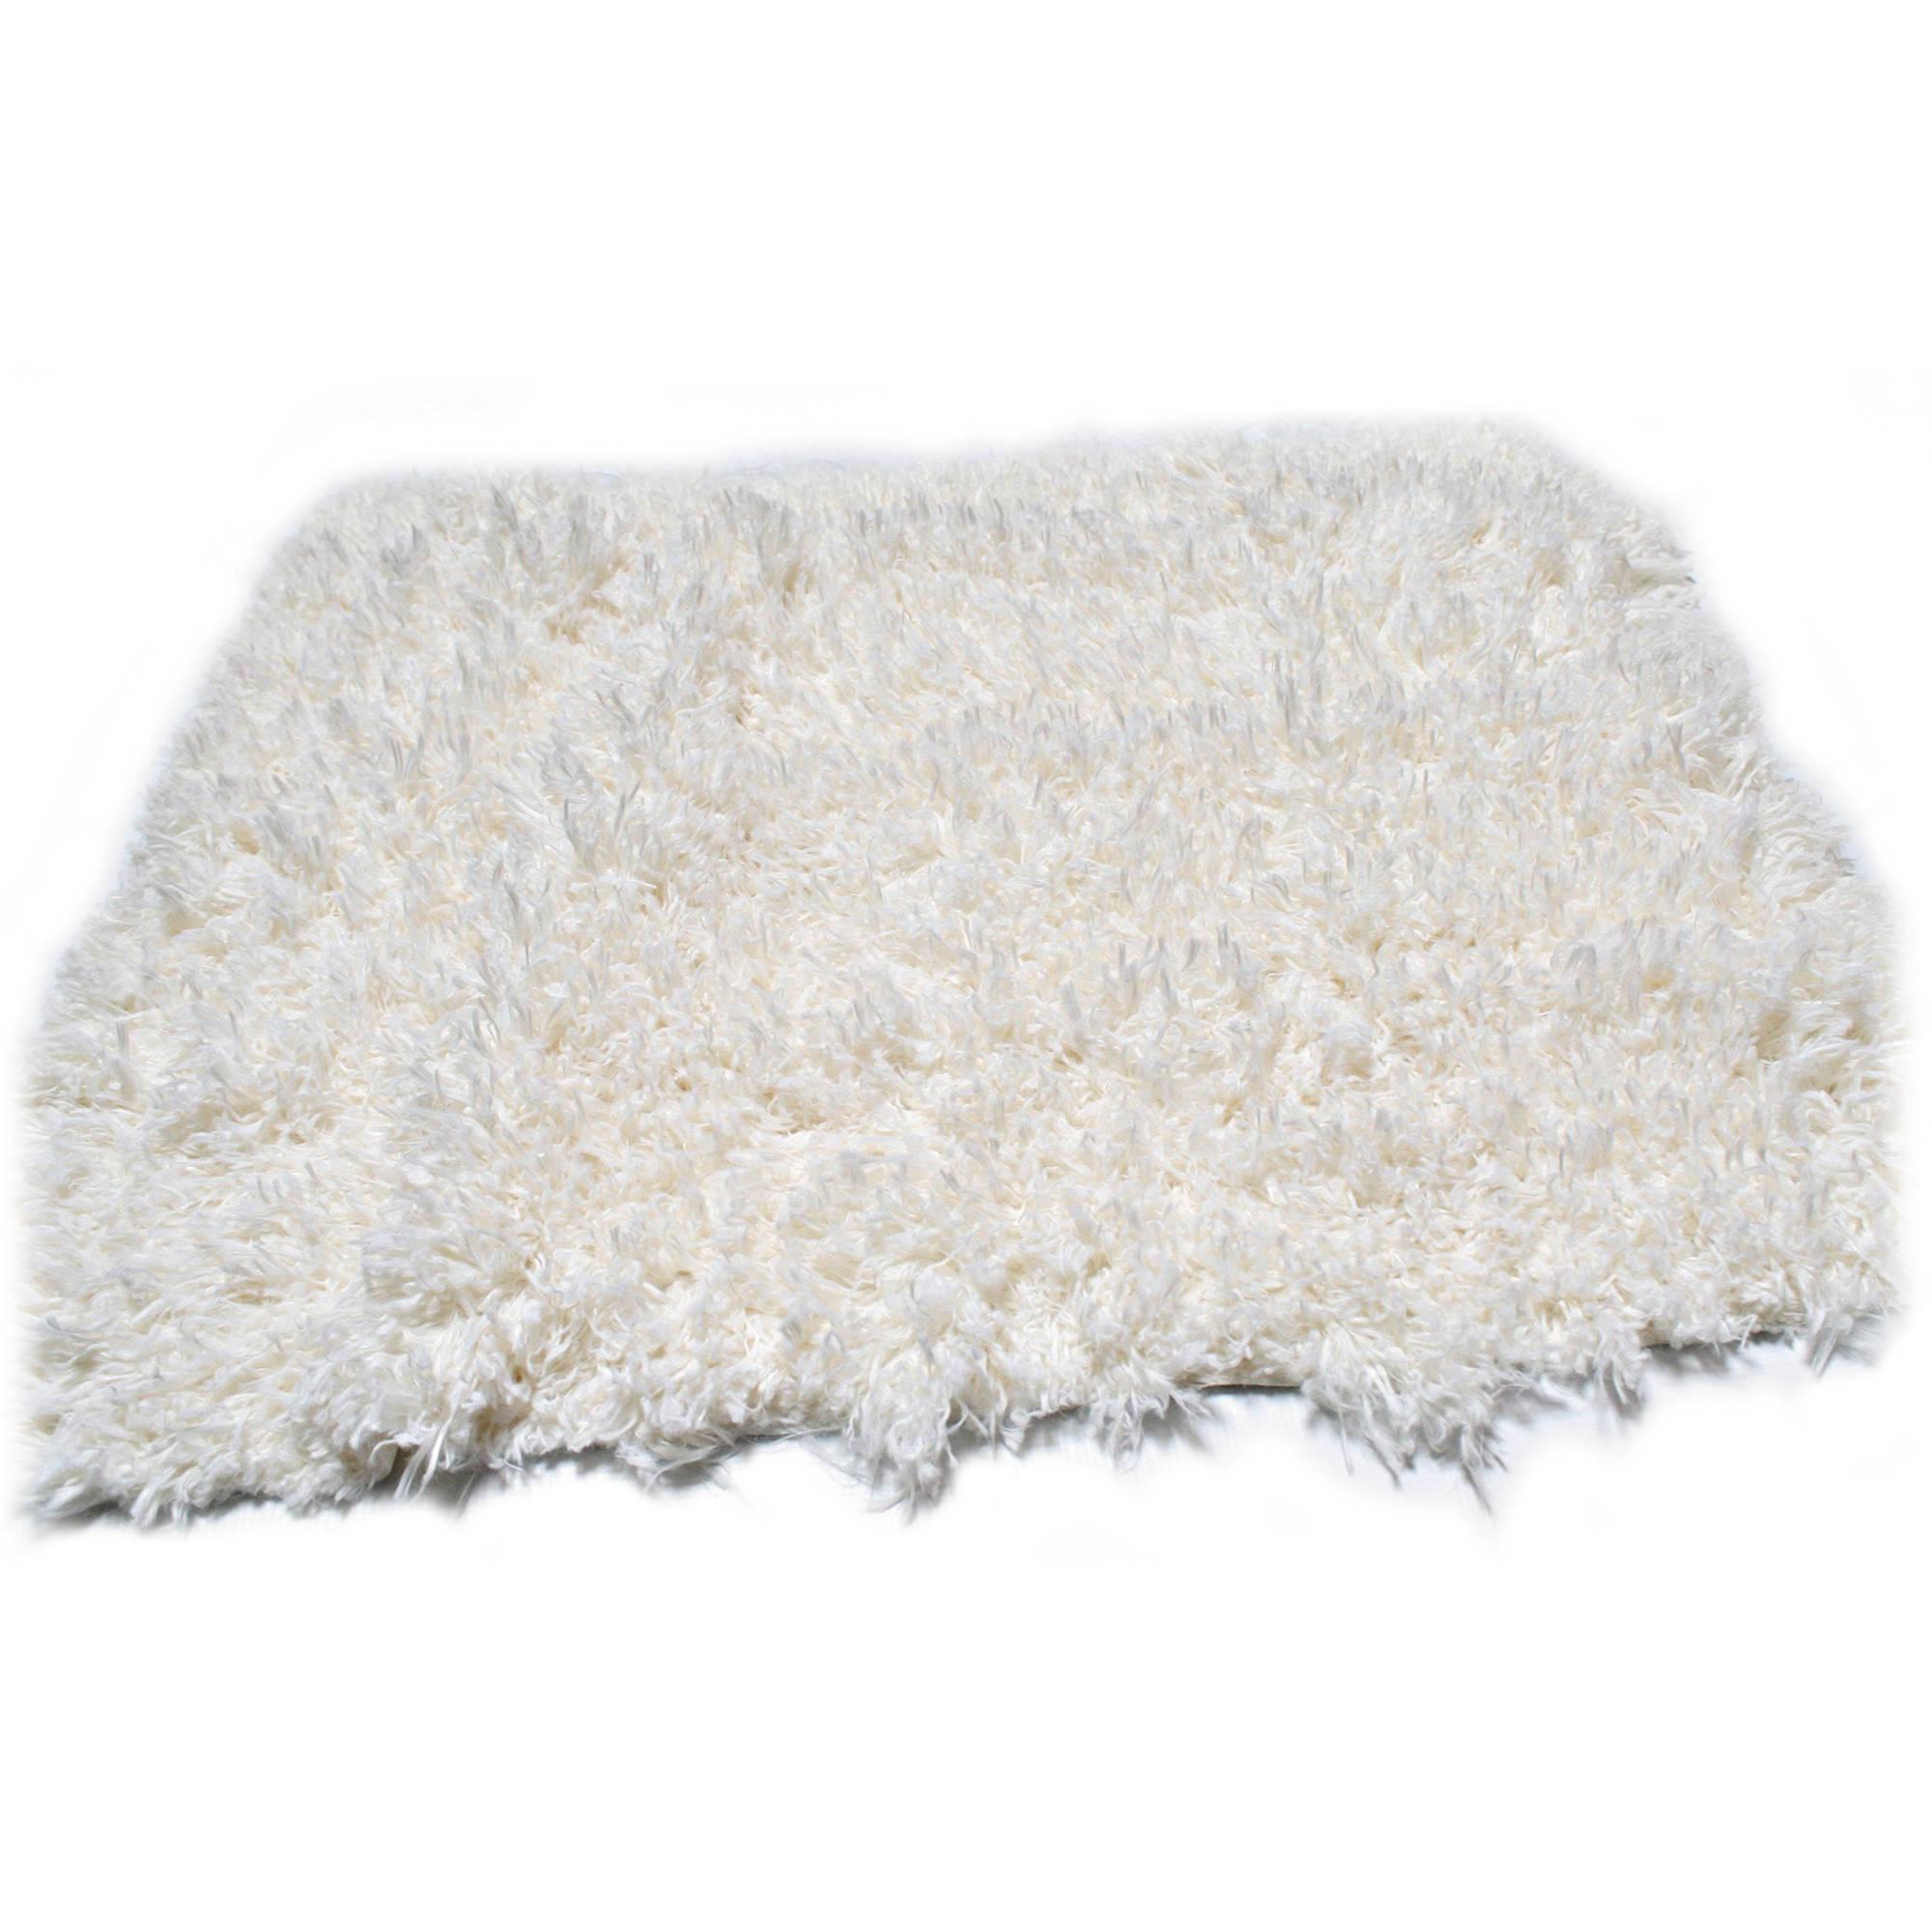 Custom Photo Props 1153 White Clouds Faux Fur 1047636